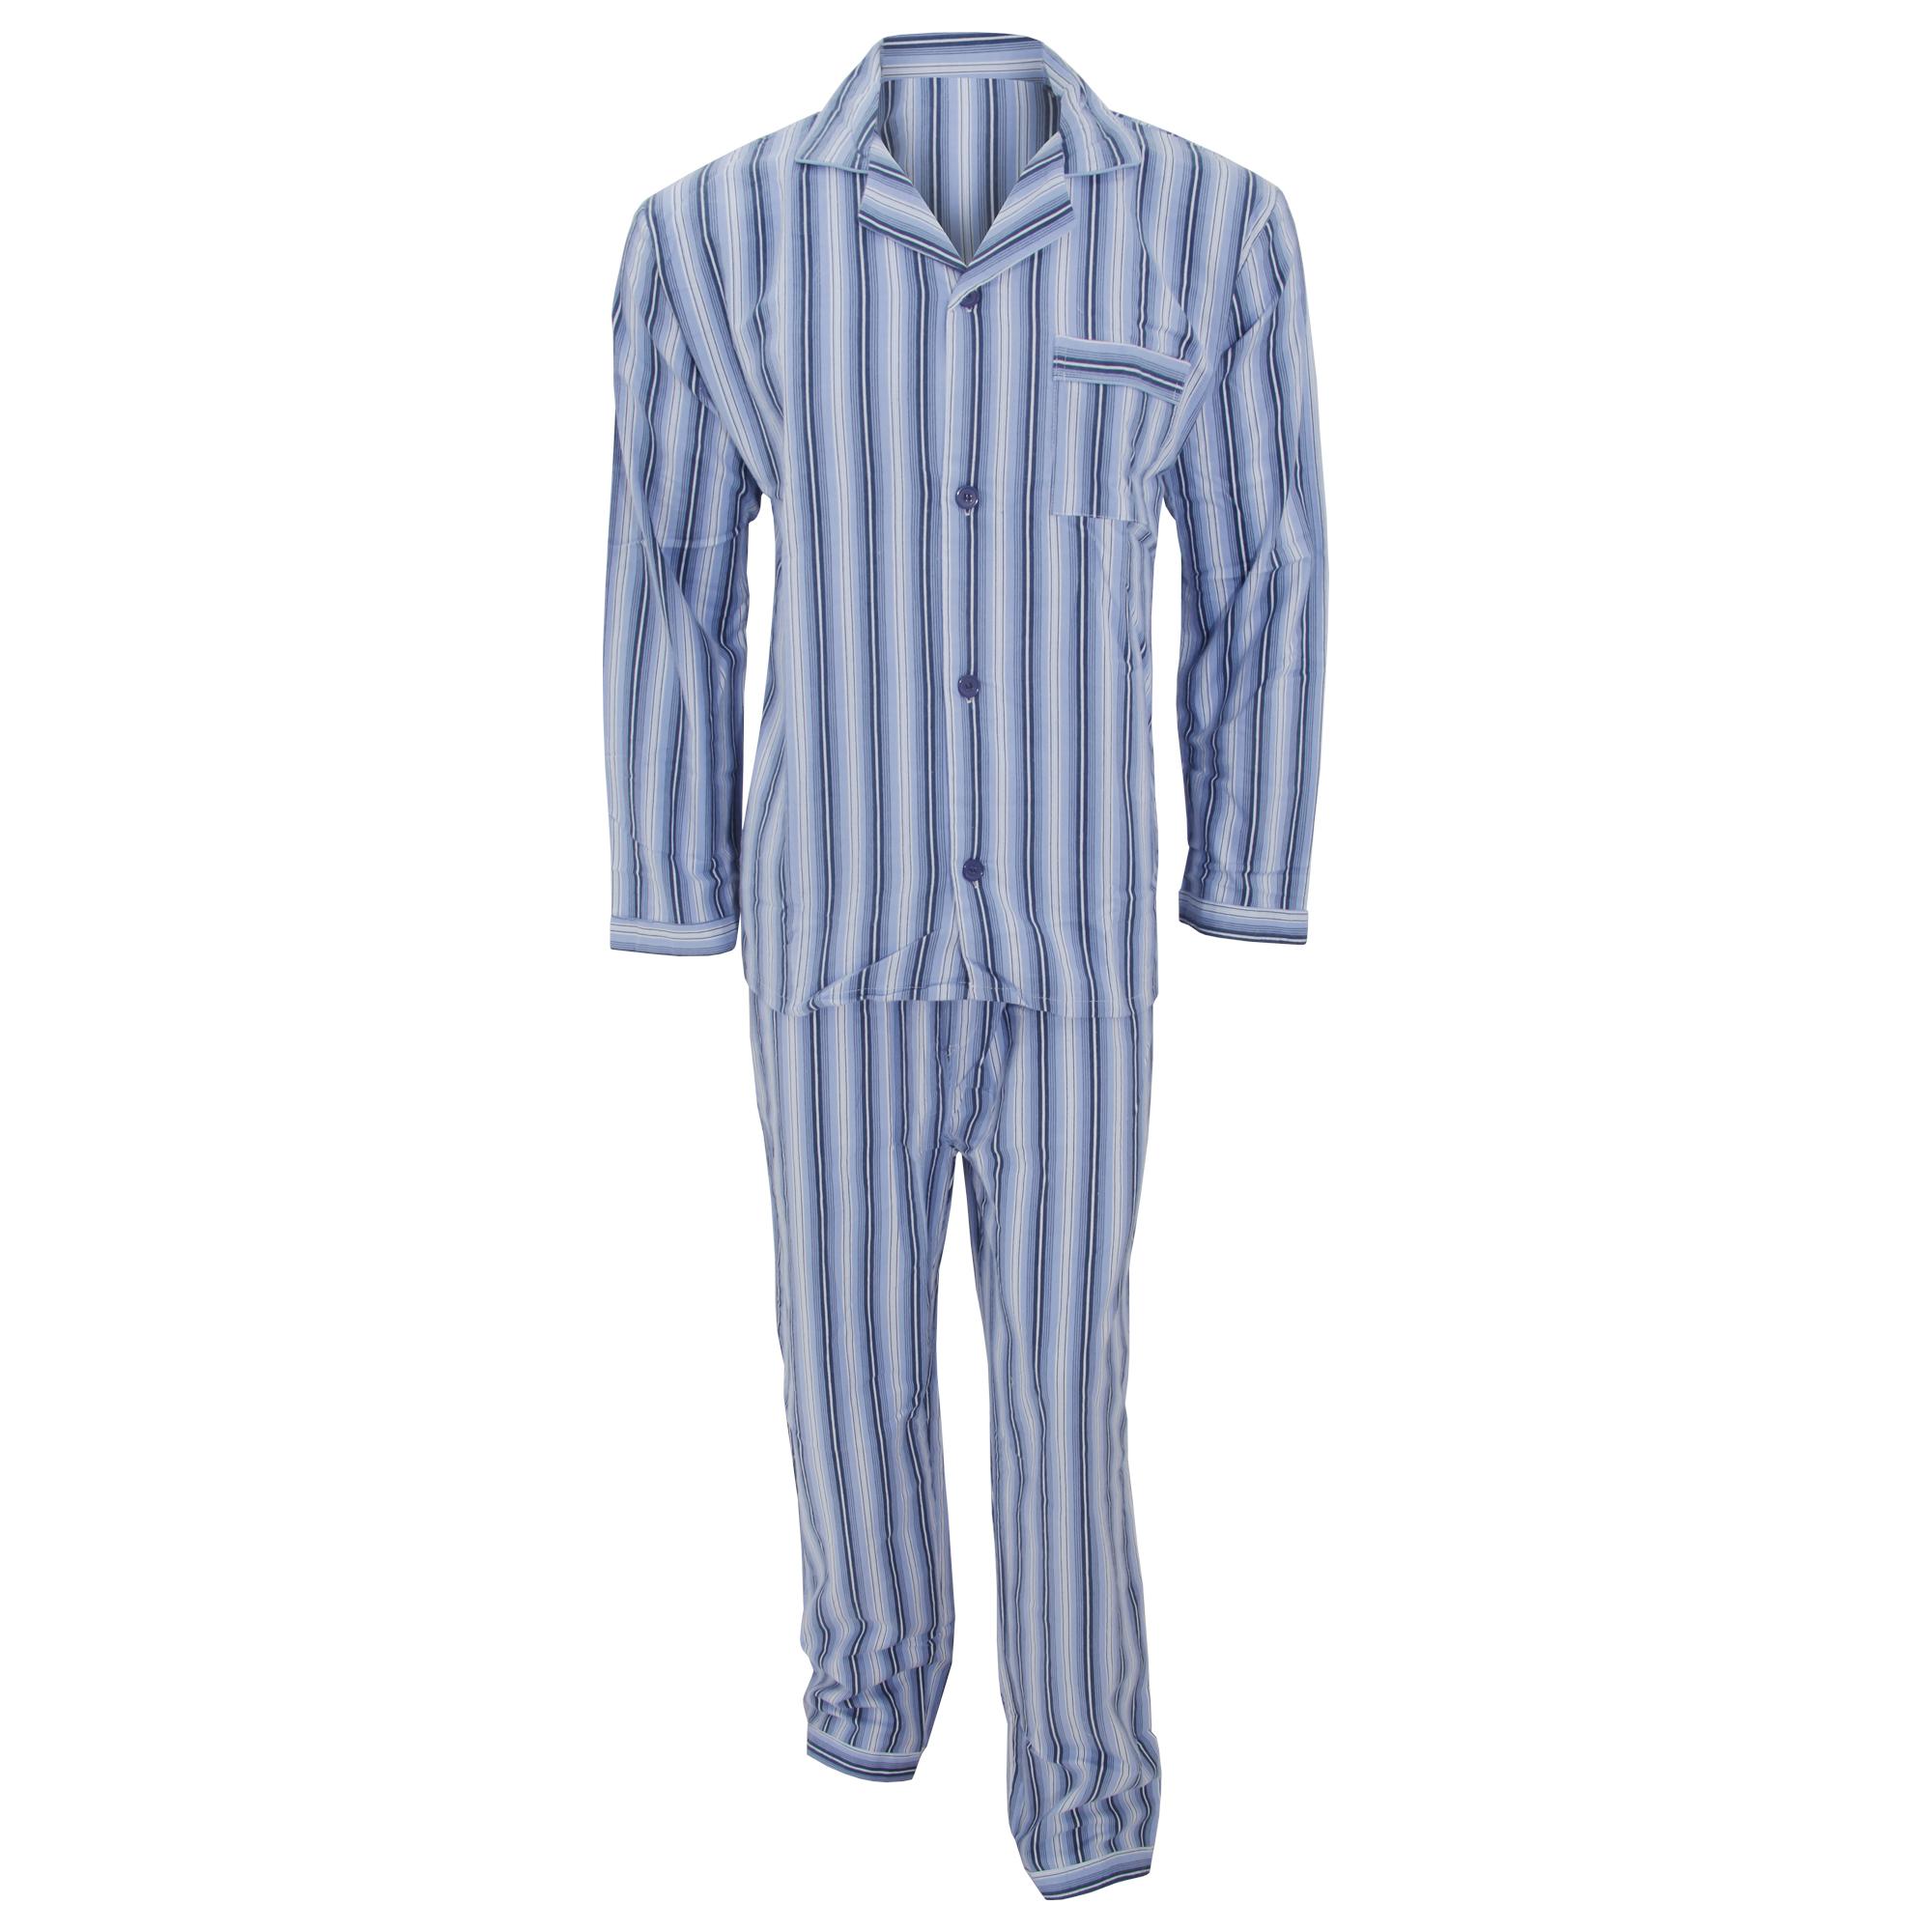 herren langarm flanell pyjama mit streifen muster ebay. Black Bedroom Furniture Sets. Home Design Ideas